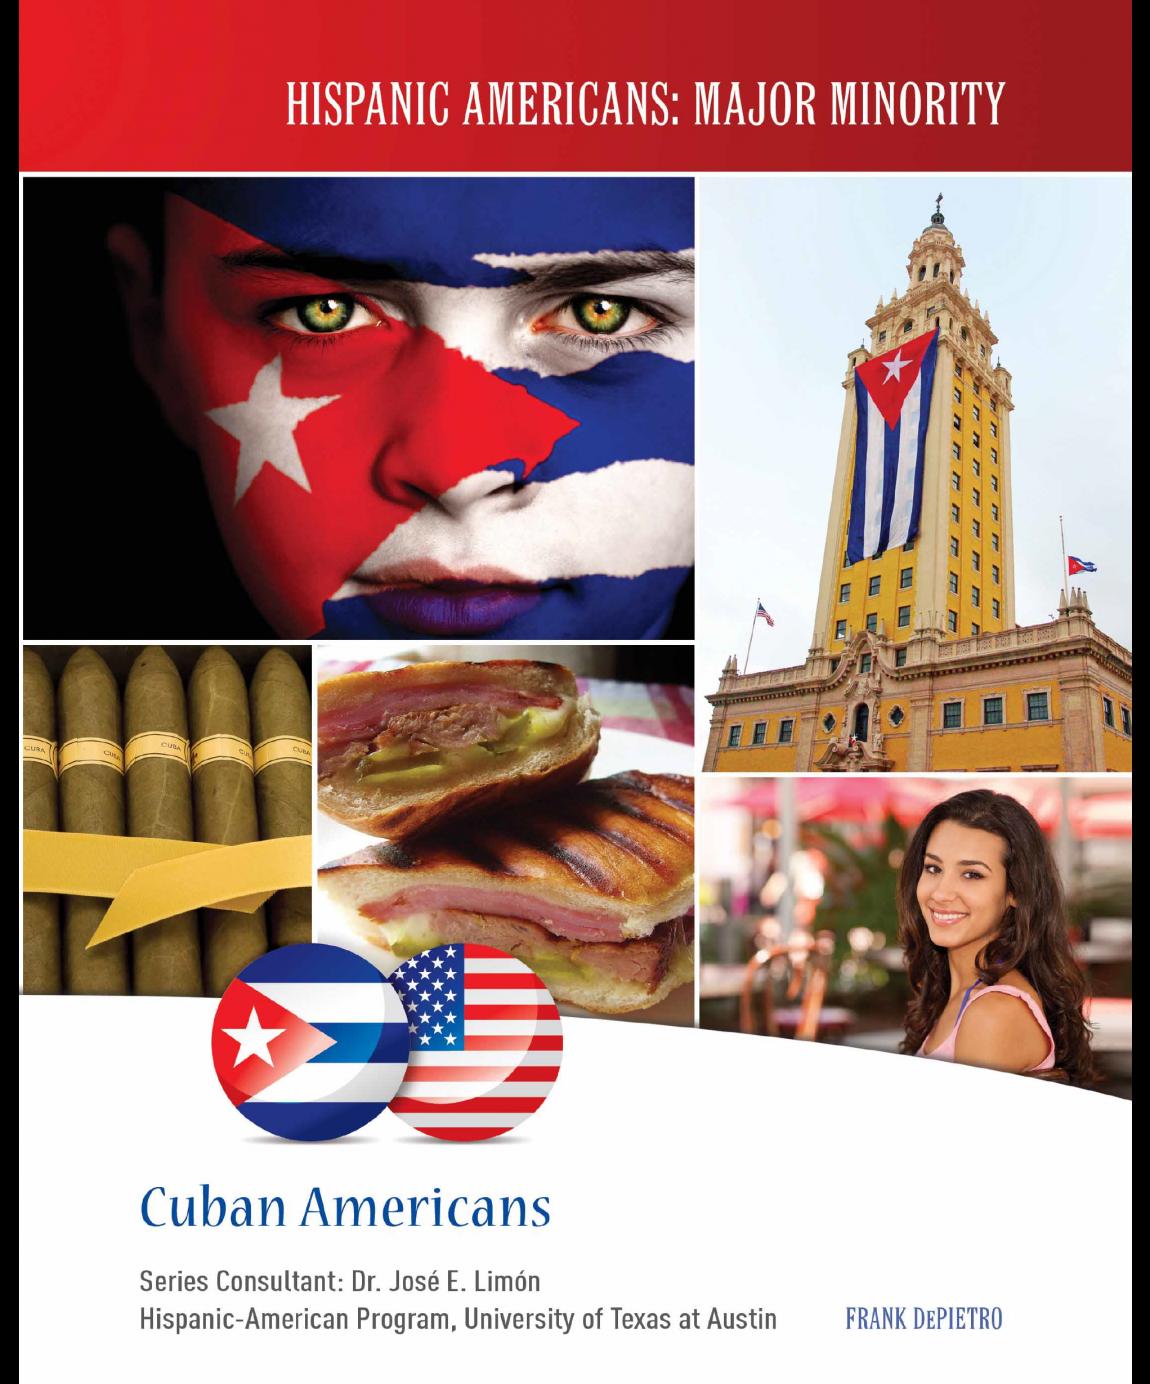 cuban-american-01.png